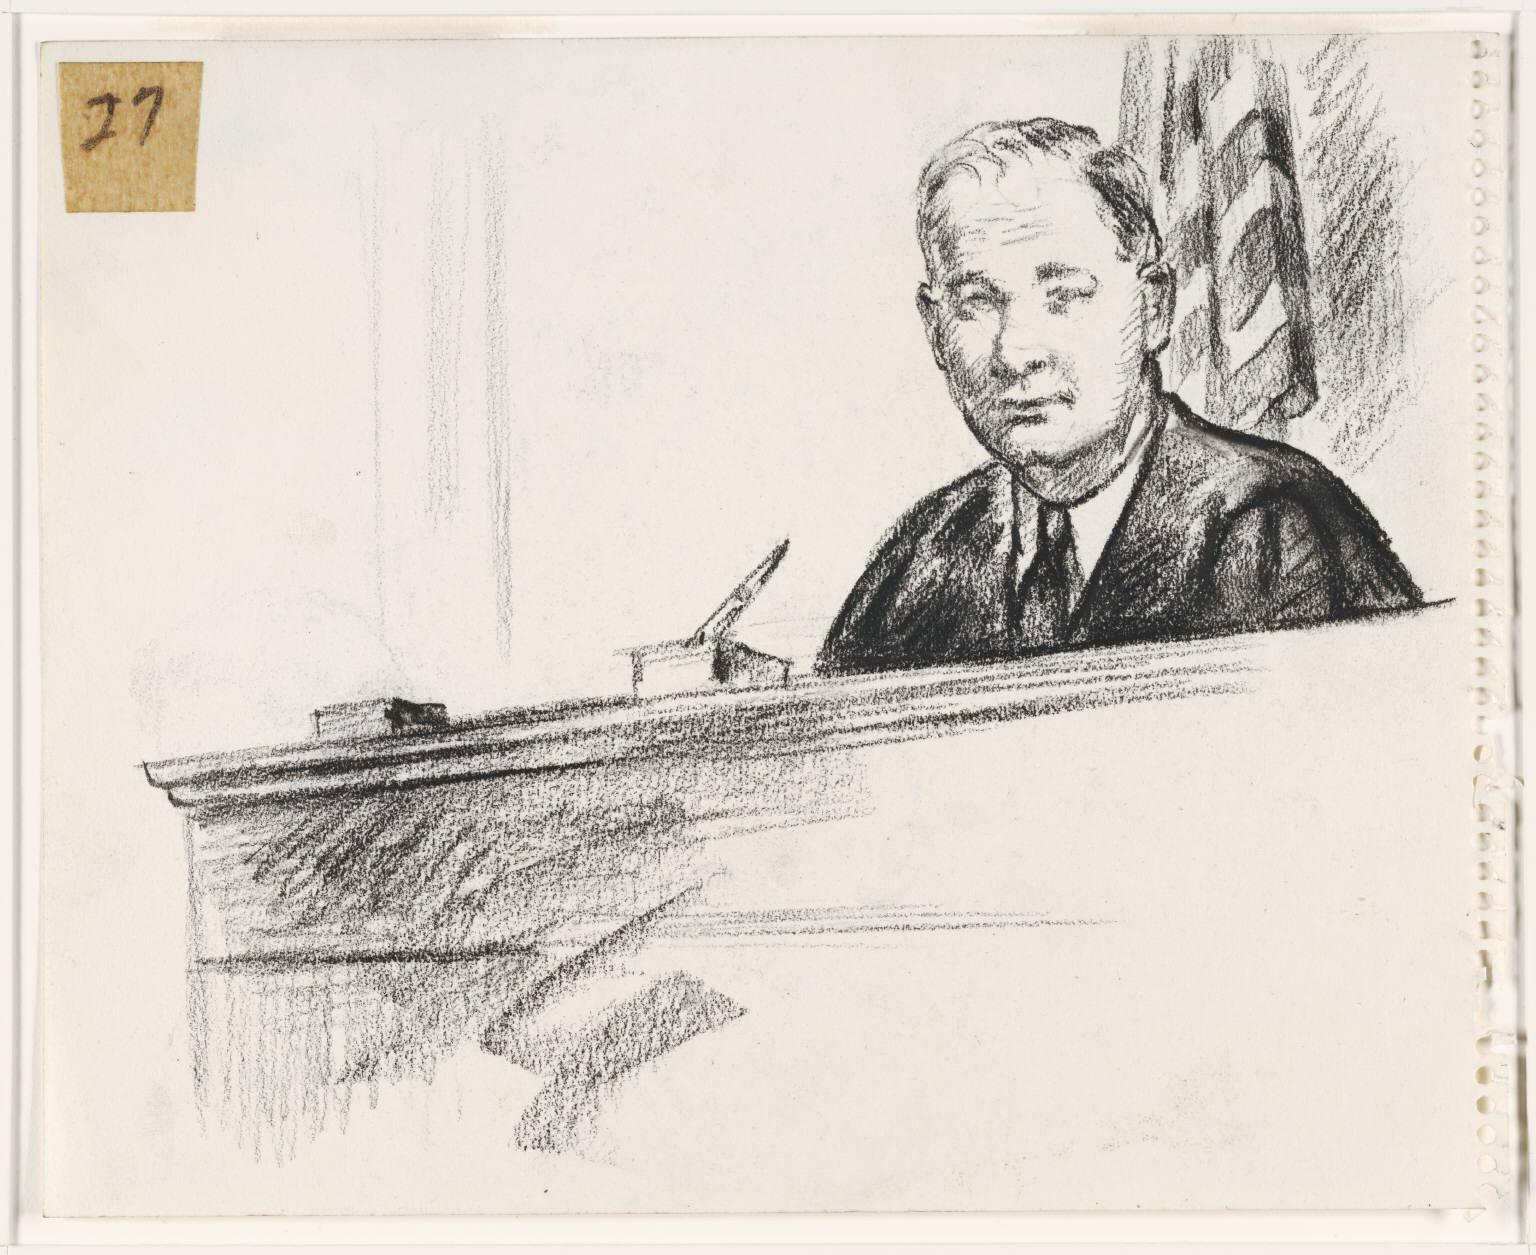 1536x1255 Fileoil Pastel (Black) Sketch Of Superior Court Judge Harold M